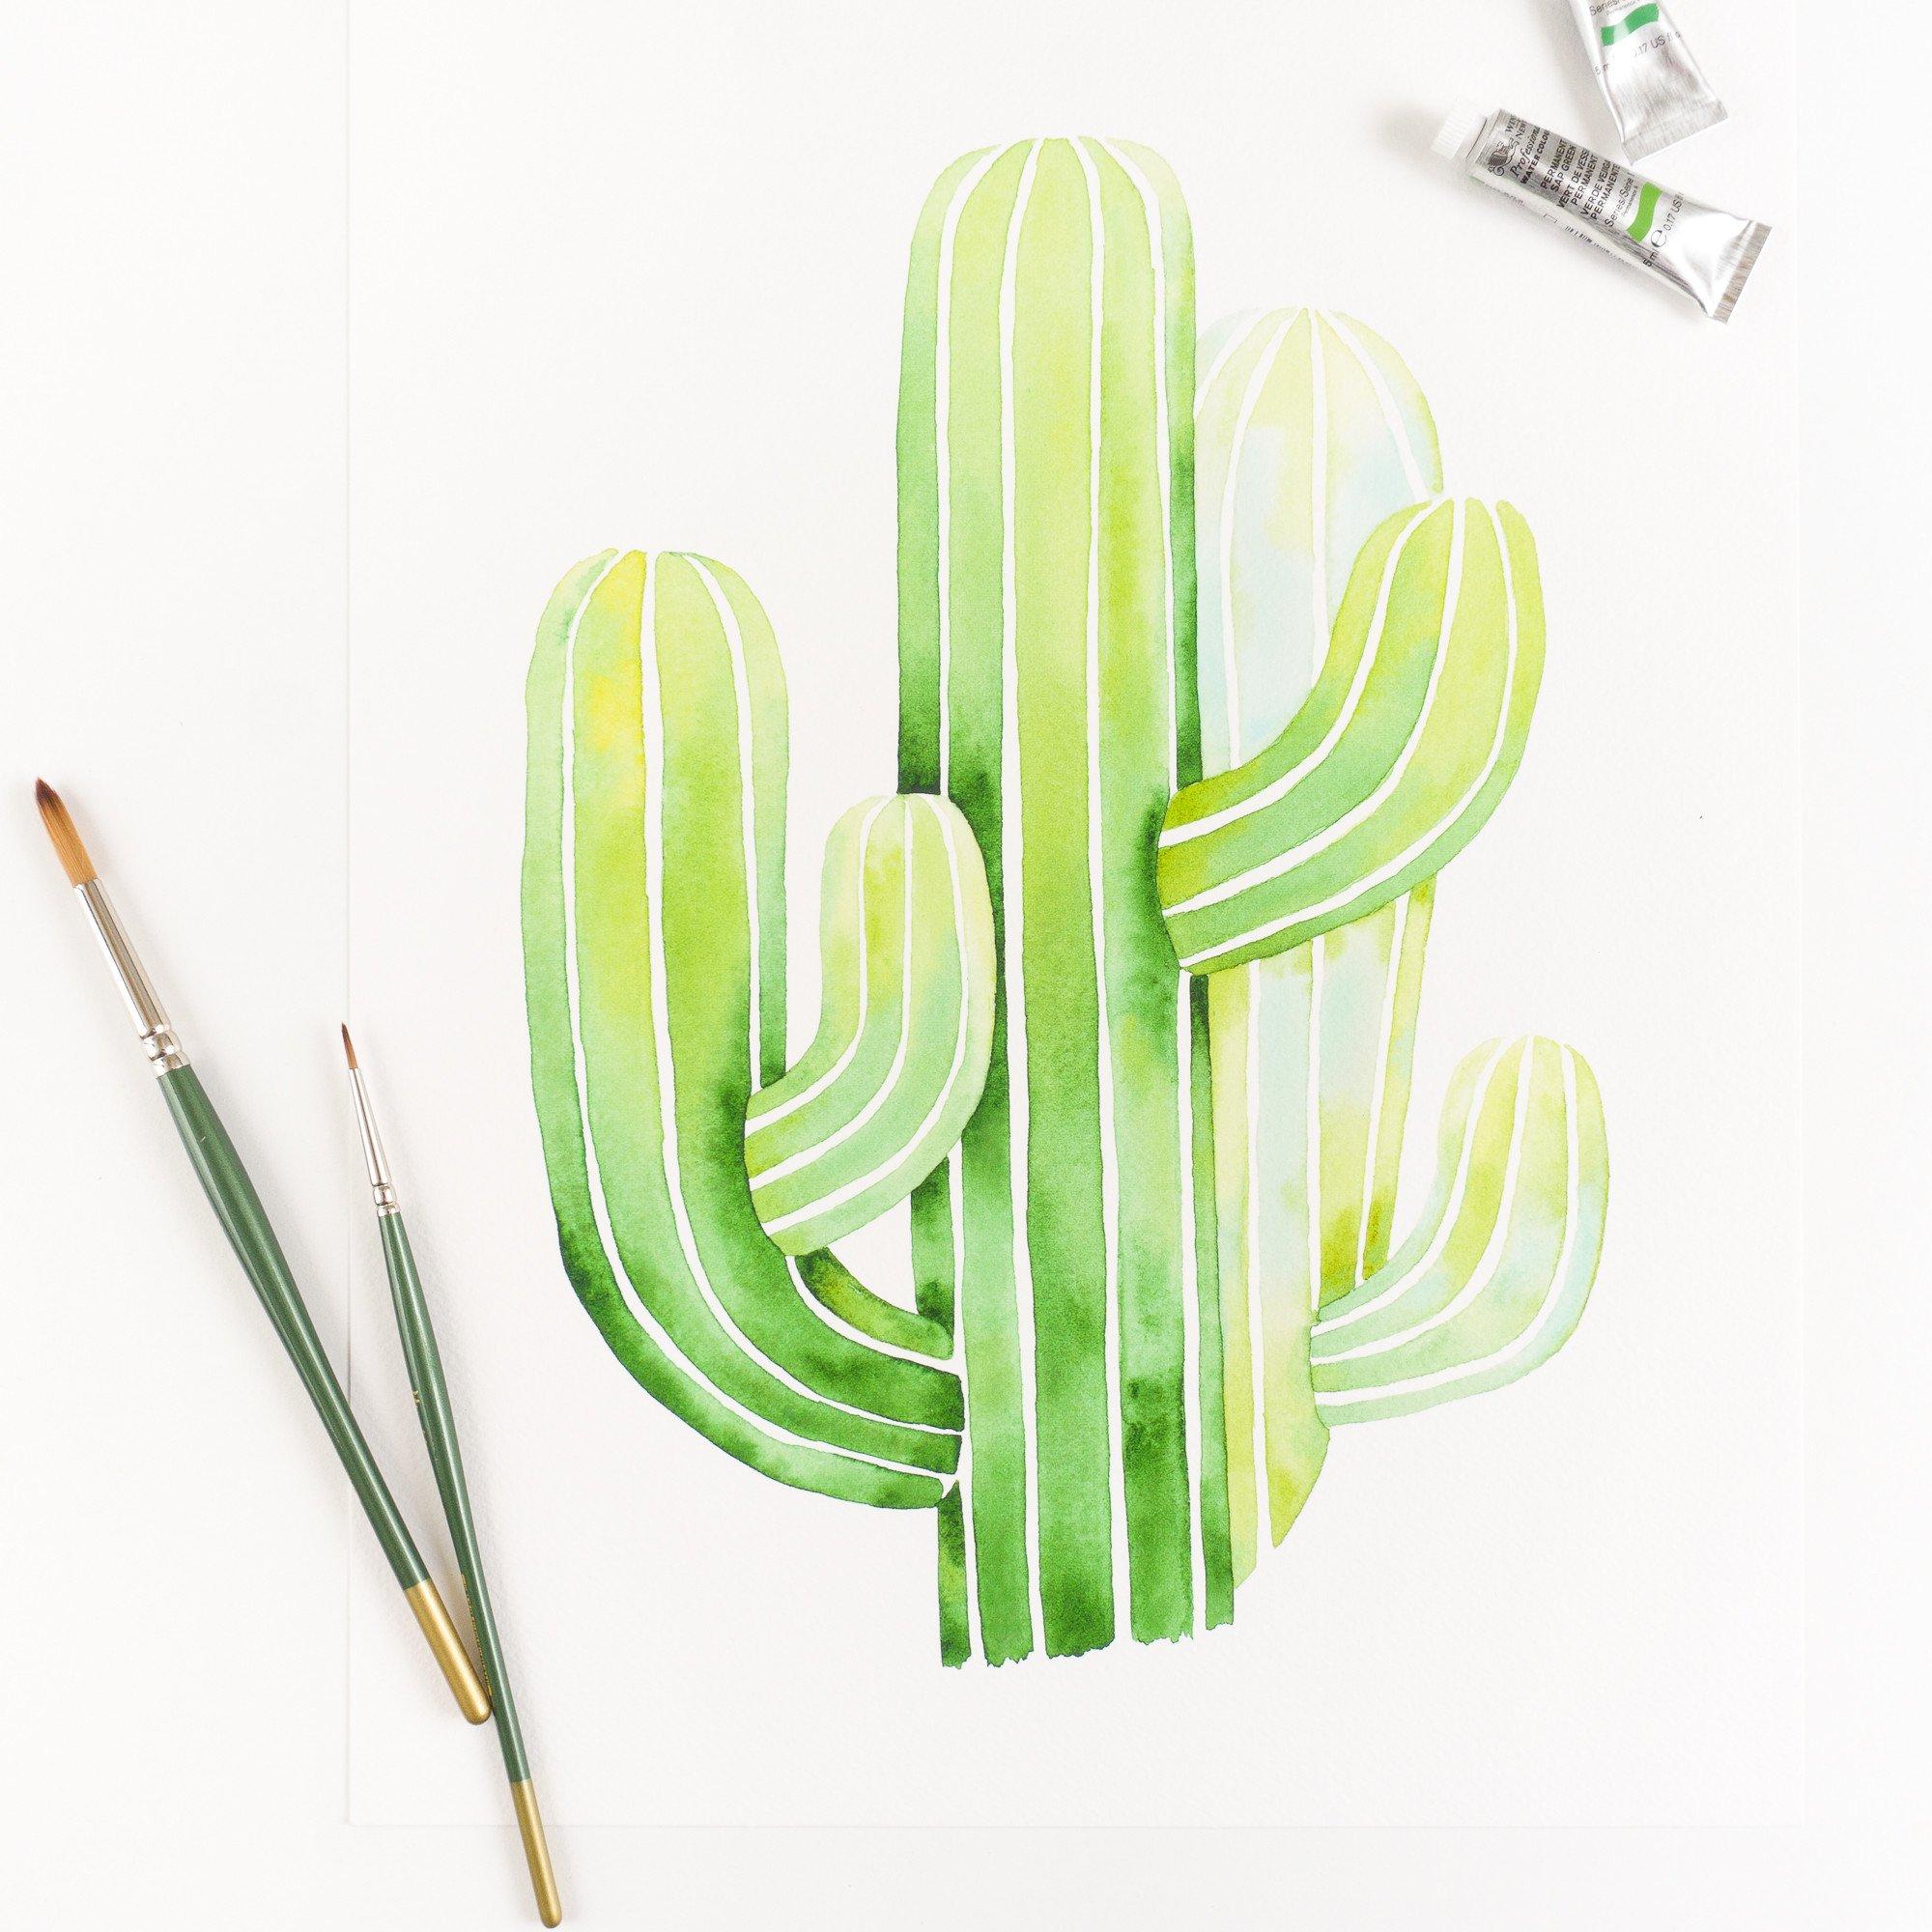 2000x2000 Saguaro Cactus